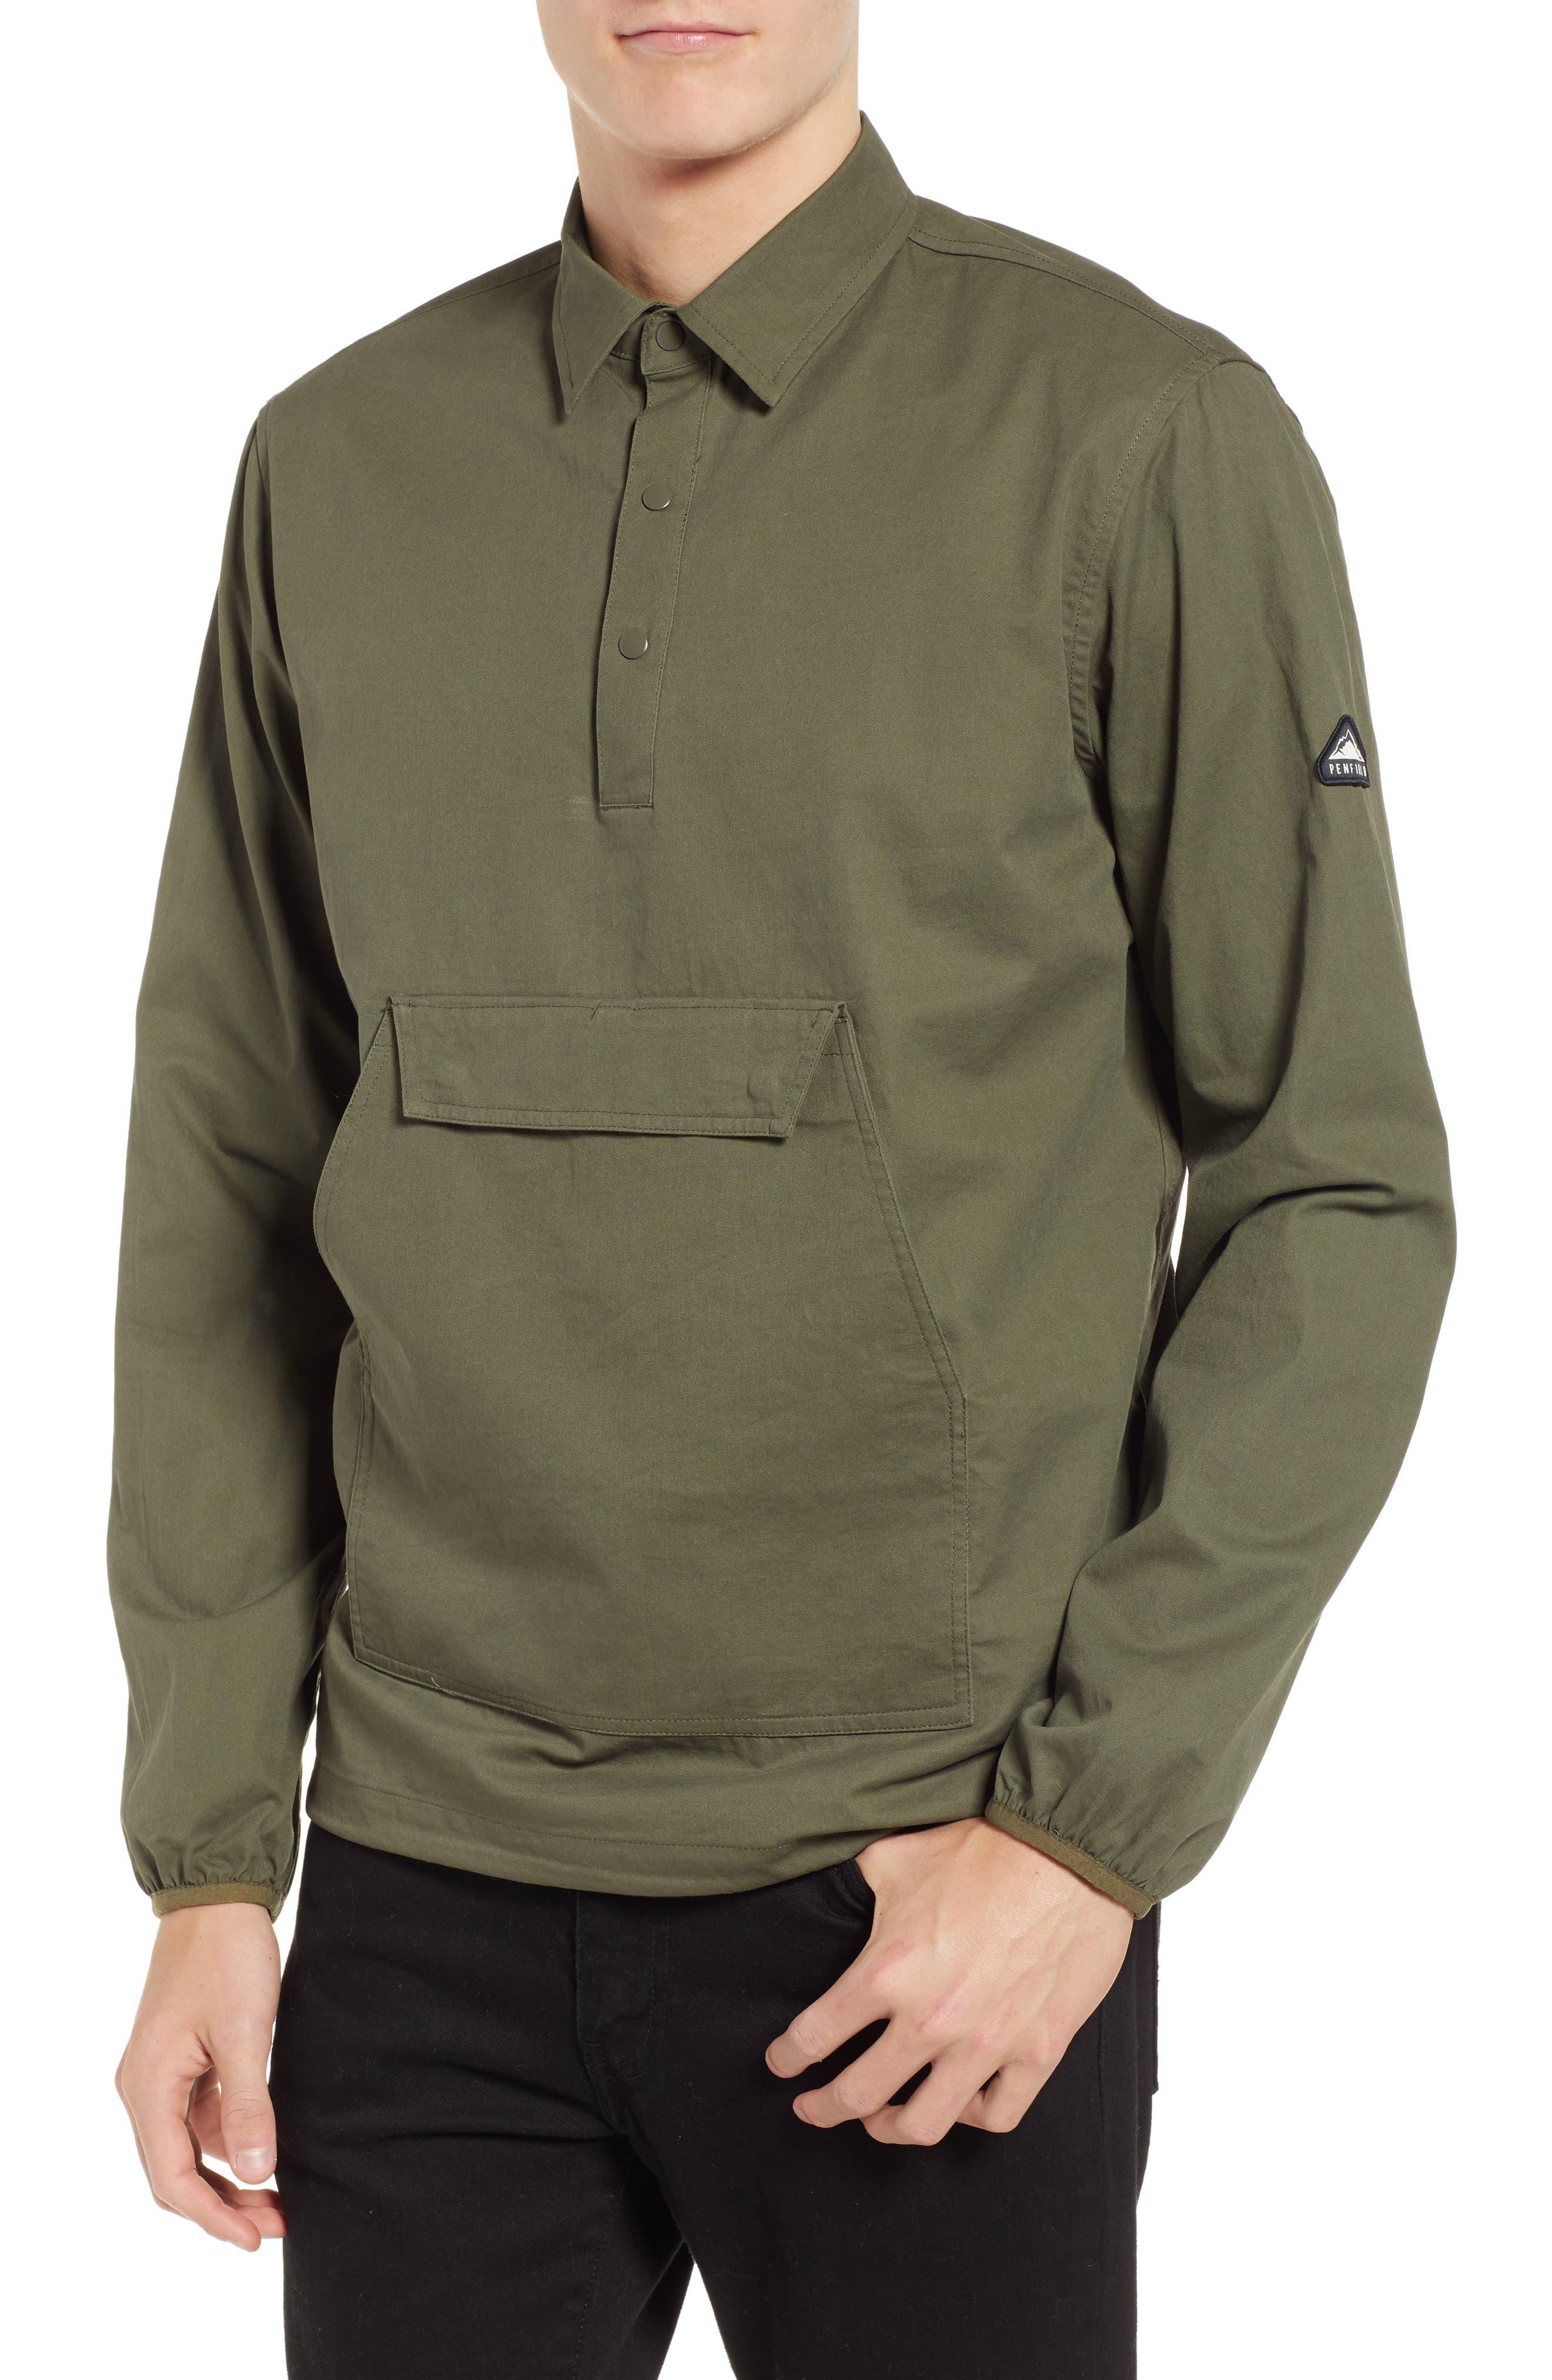 Adelanto Snap Pocket Shirt,                         Main,                         color, DARK OLIVE